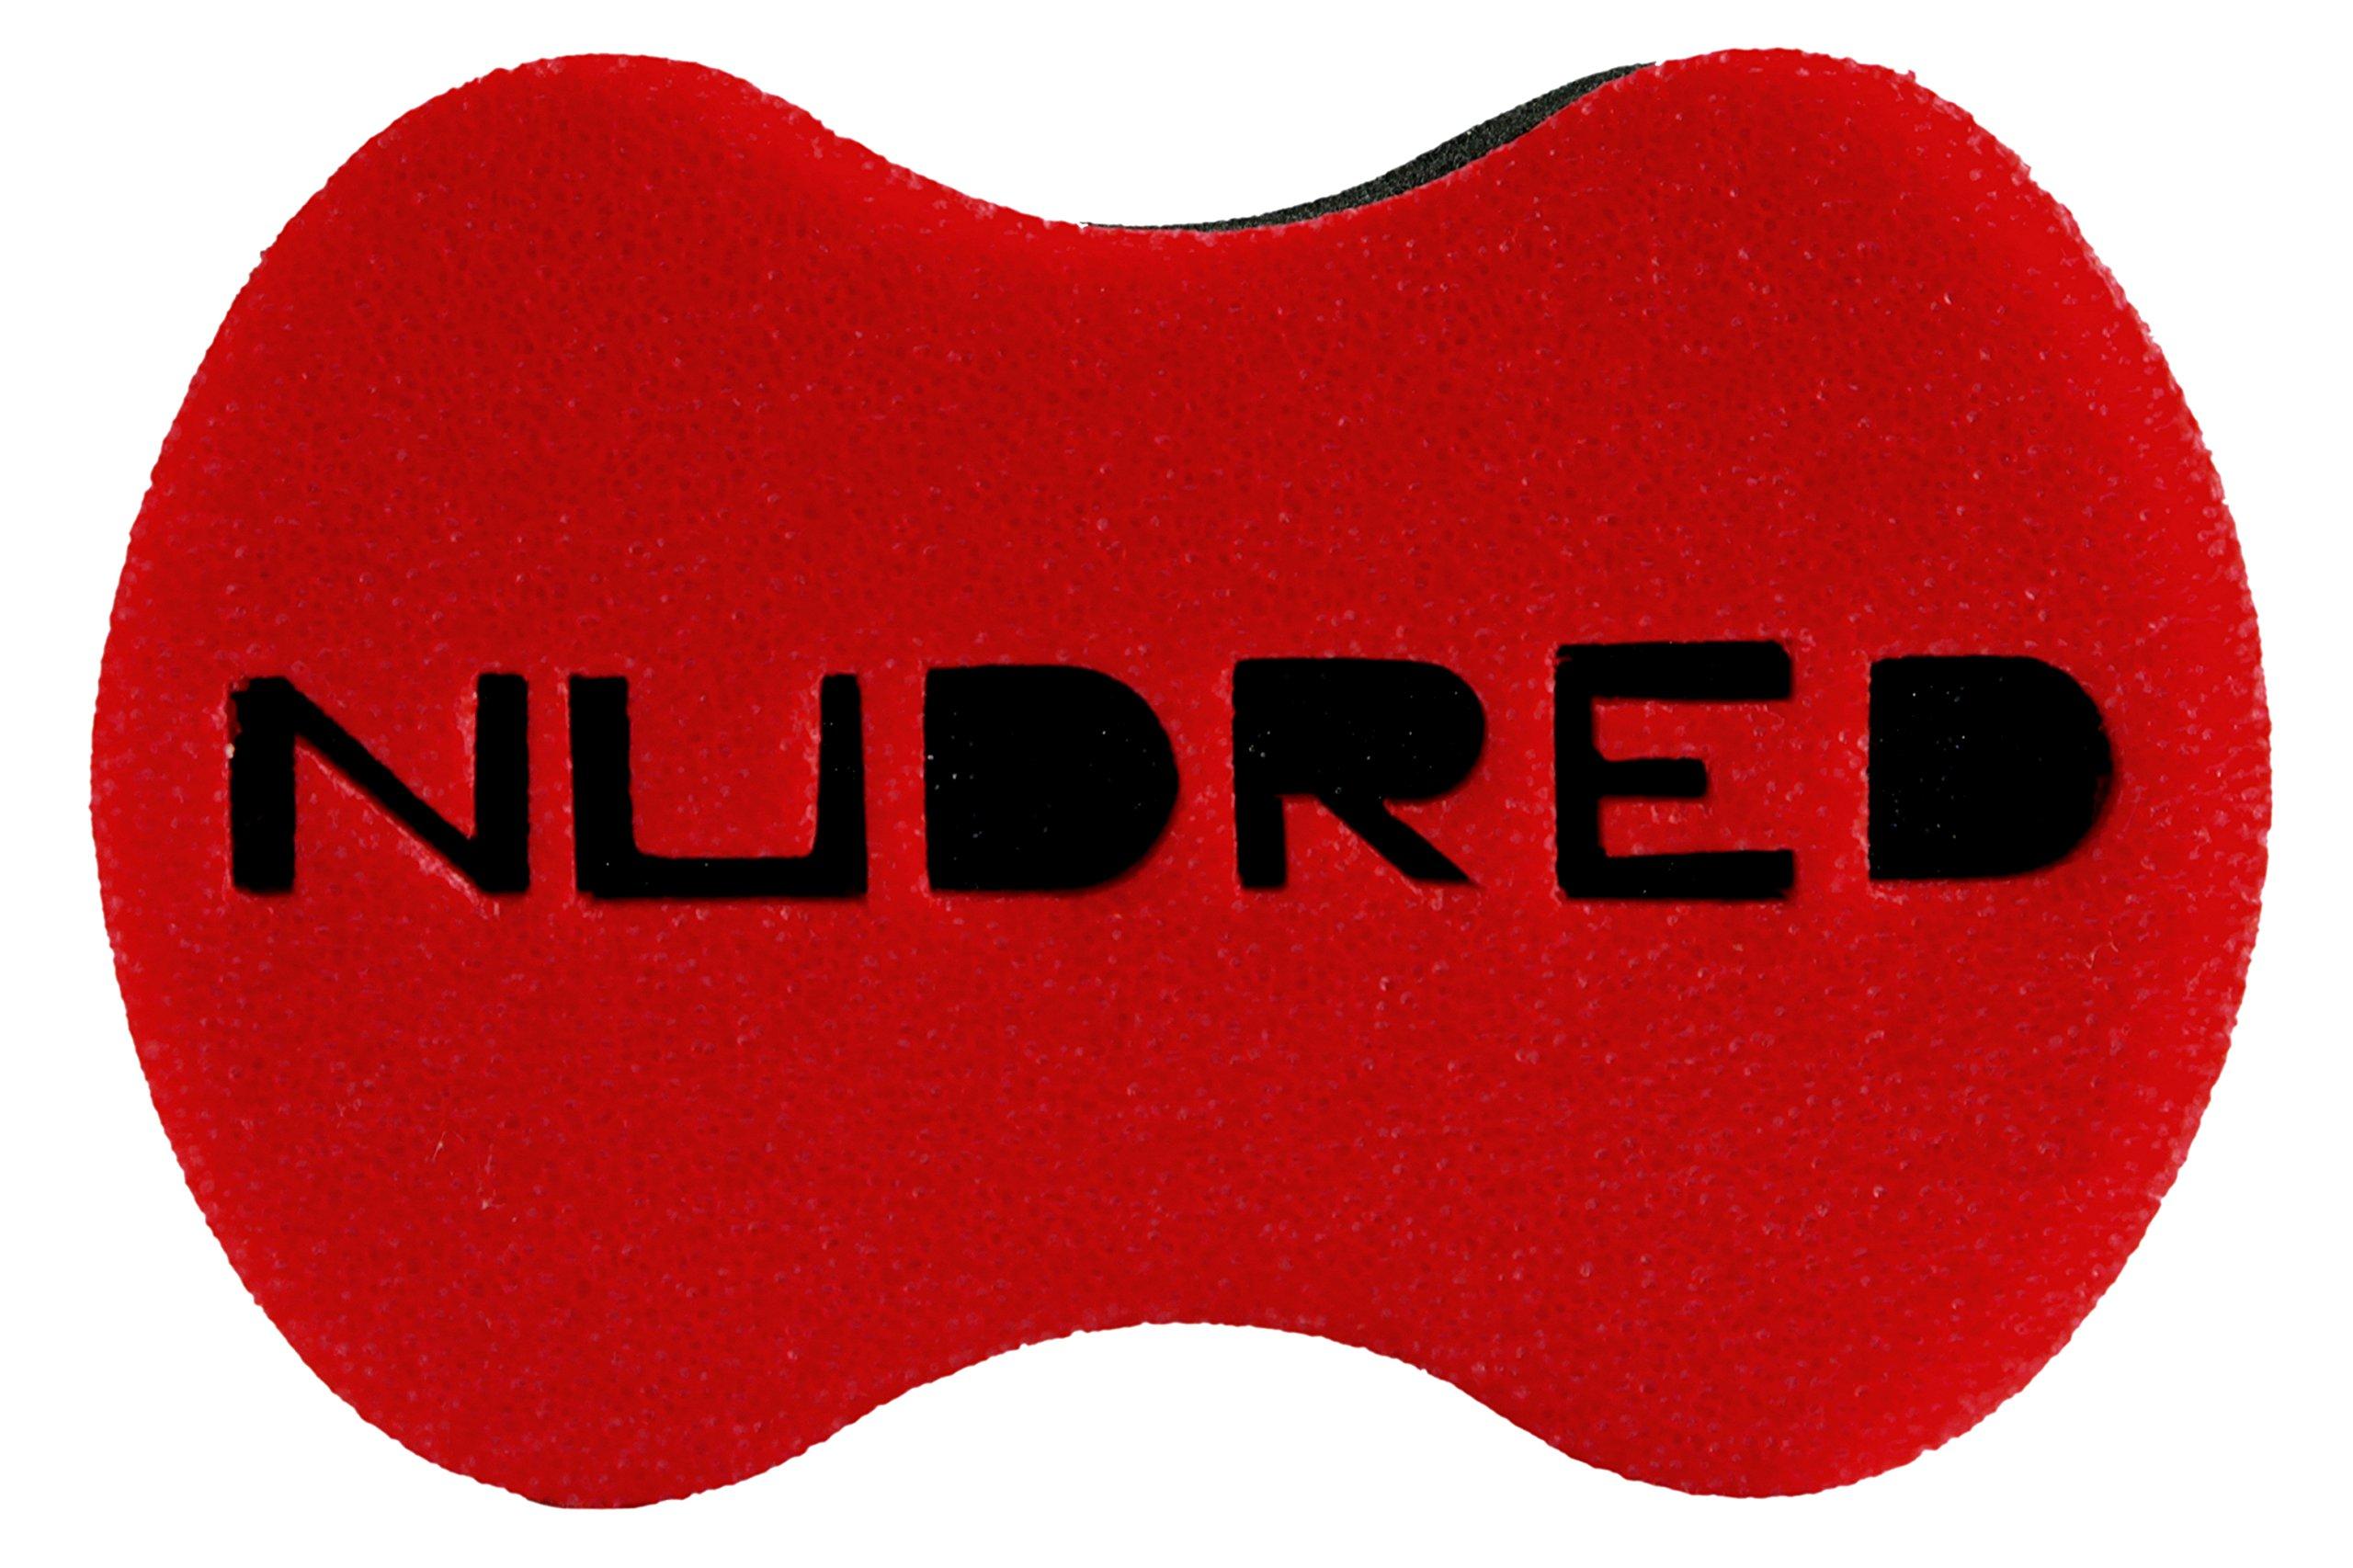 Standard Size RED Hair Sponge for Men/Women | The Original Hair Sponge | The NUDRED Natural Hair Care System